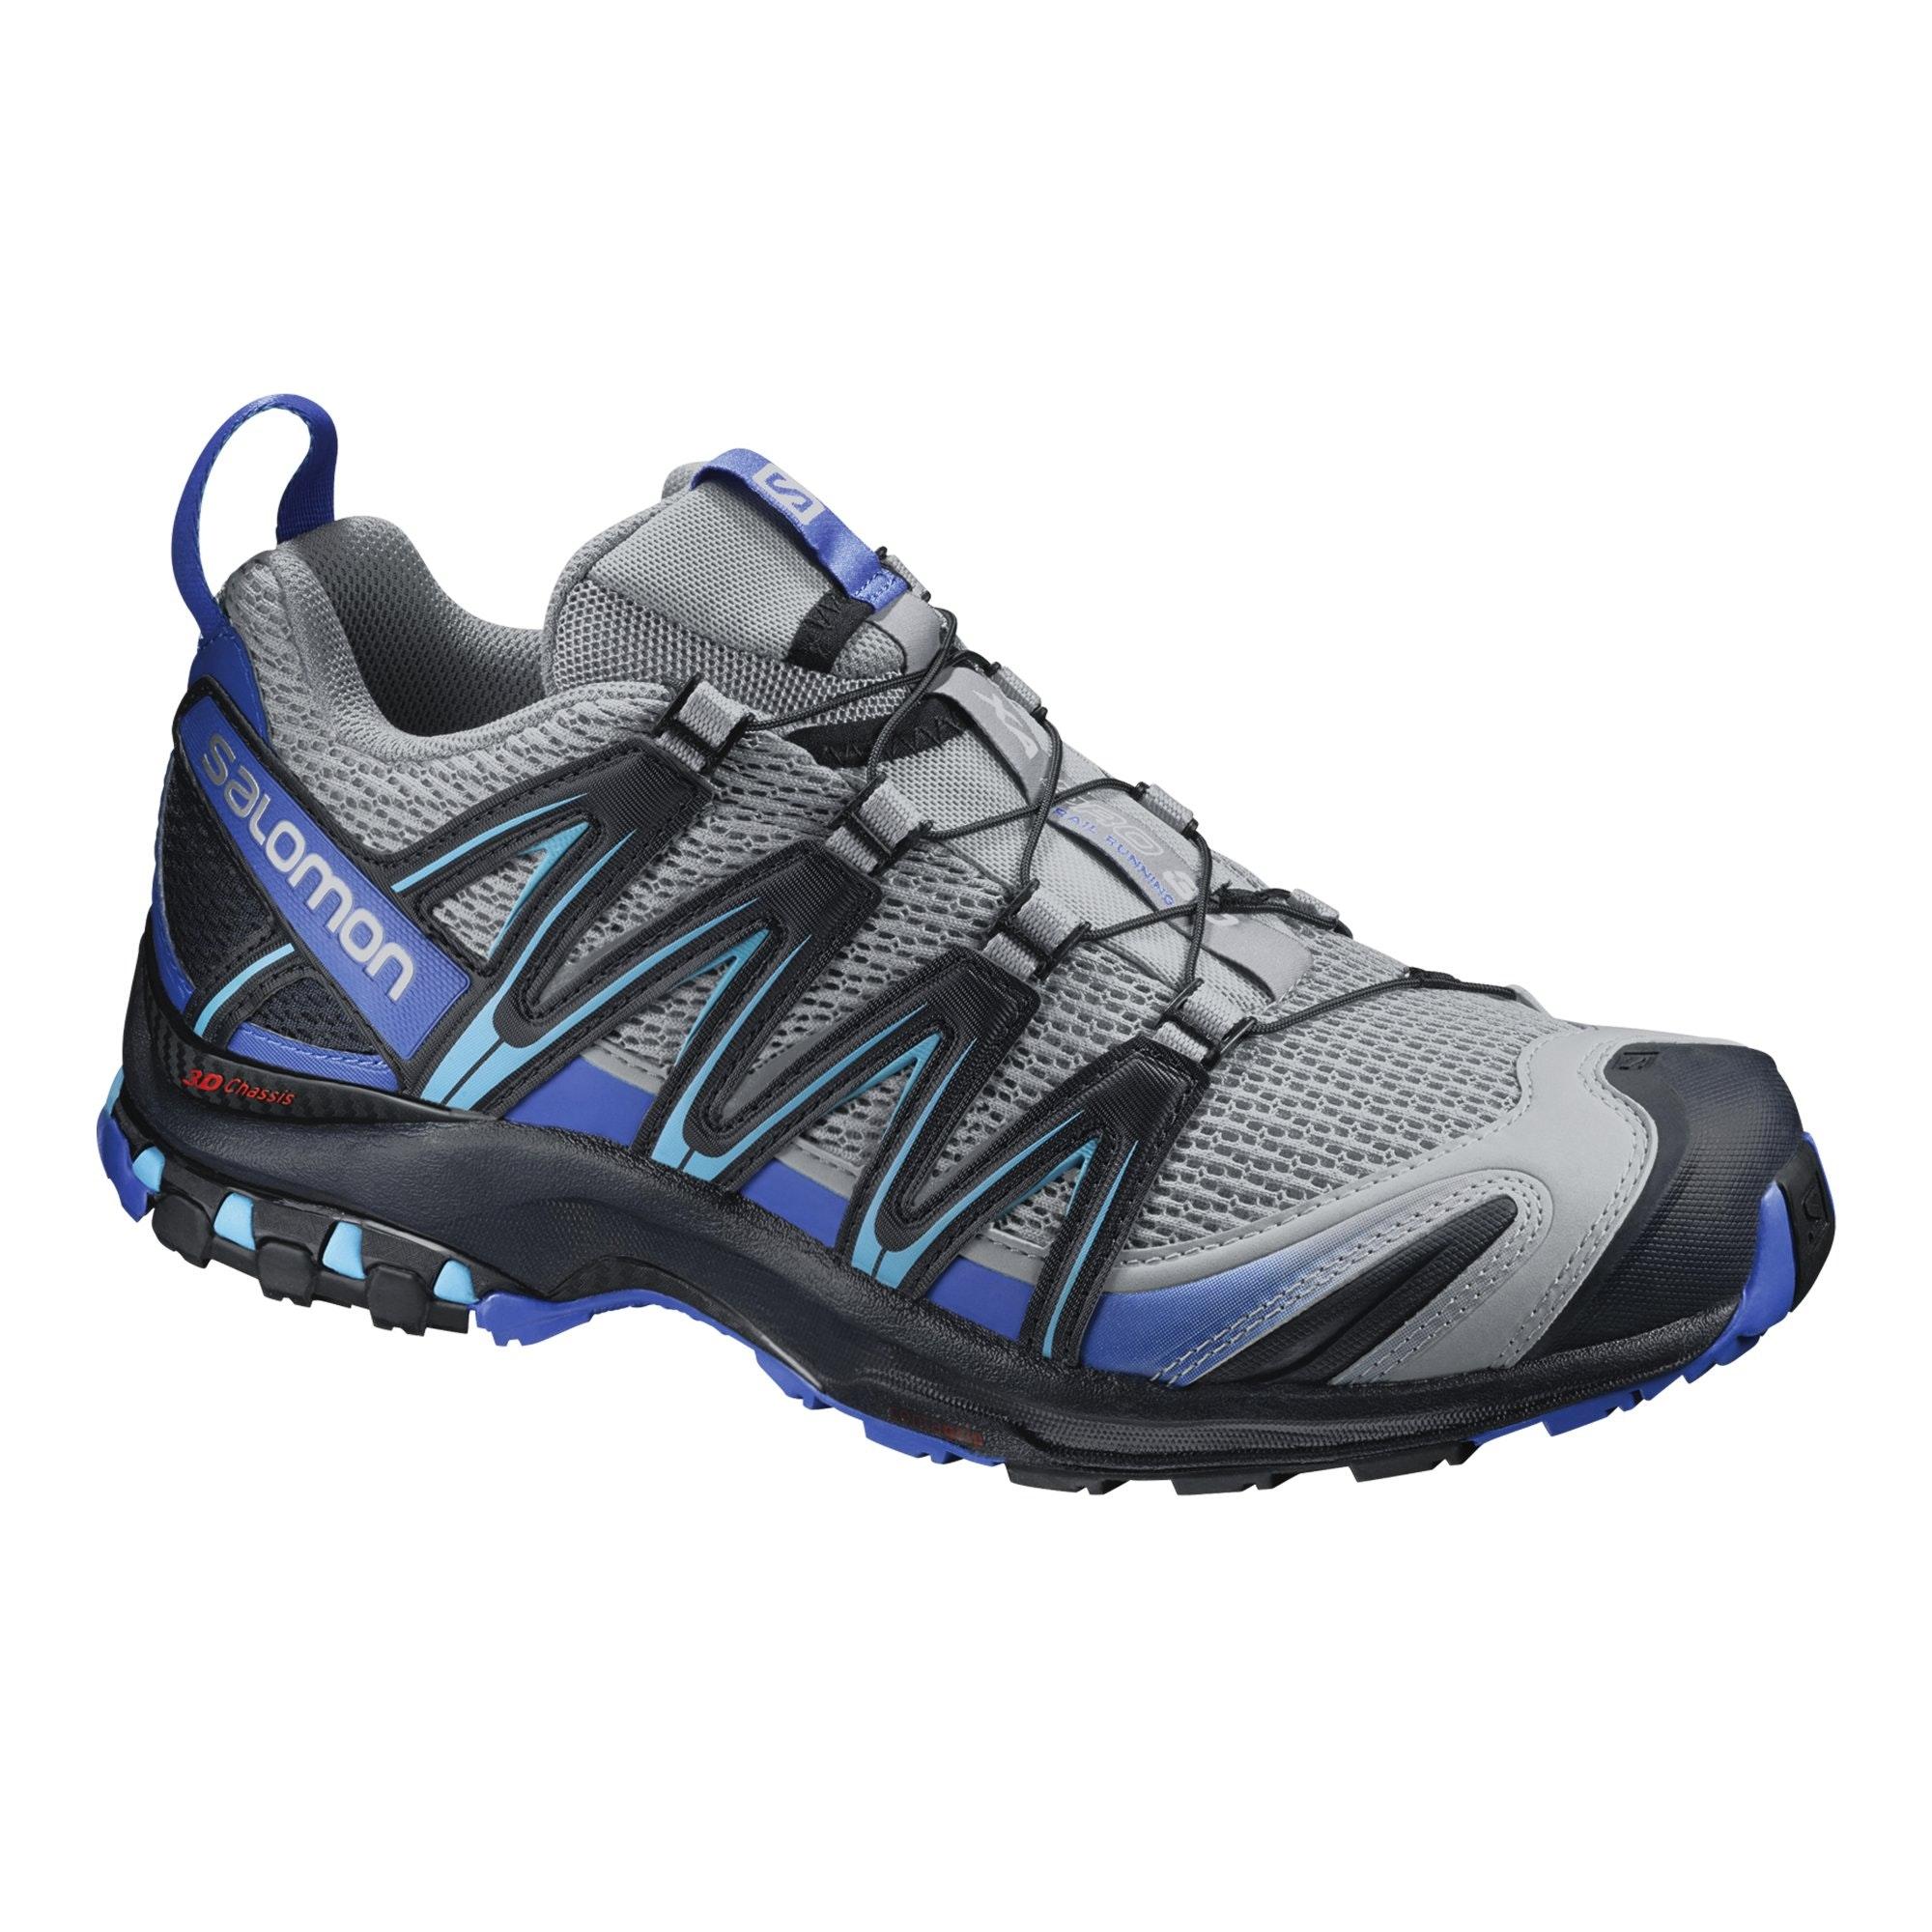 salomon xa pro 3d men 39 s trail running shoes methyl blue light grey black. Black Bedroom Furniture Sets. Home Design Ideas